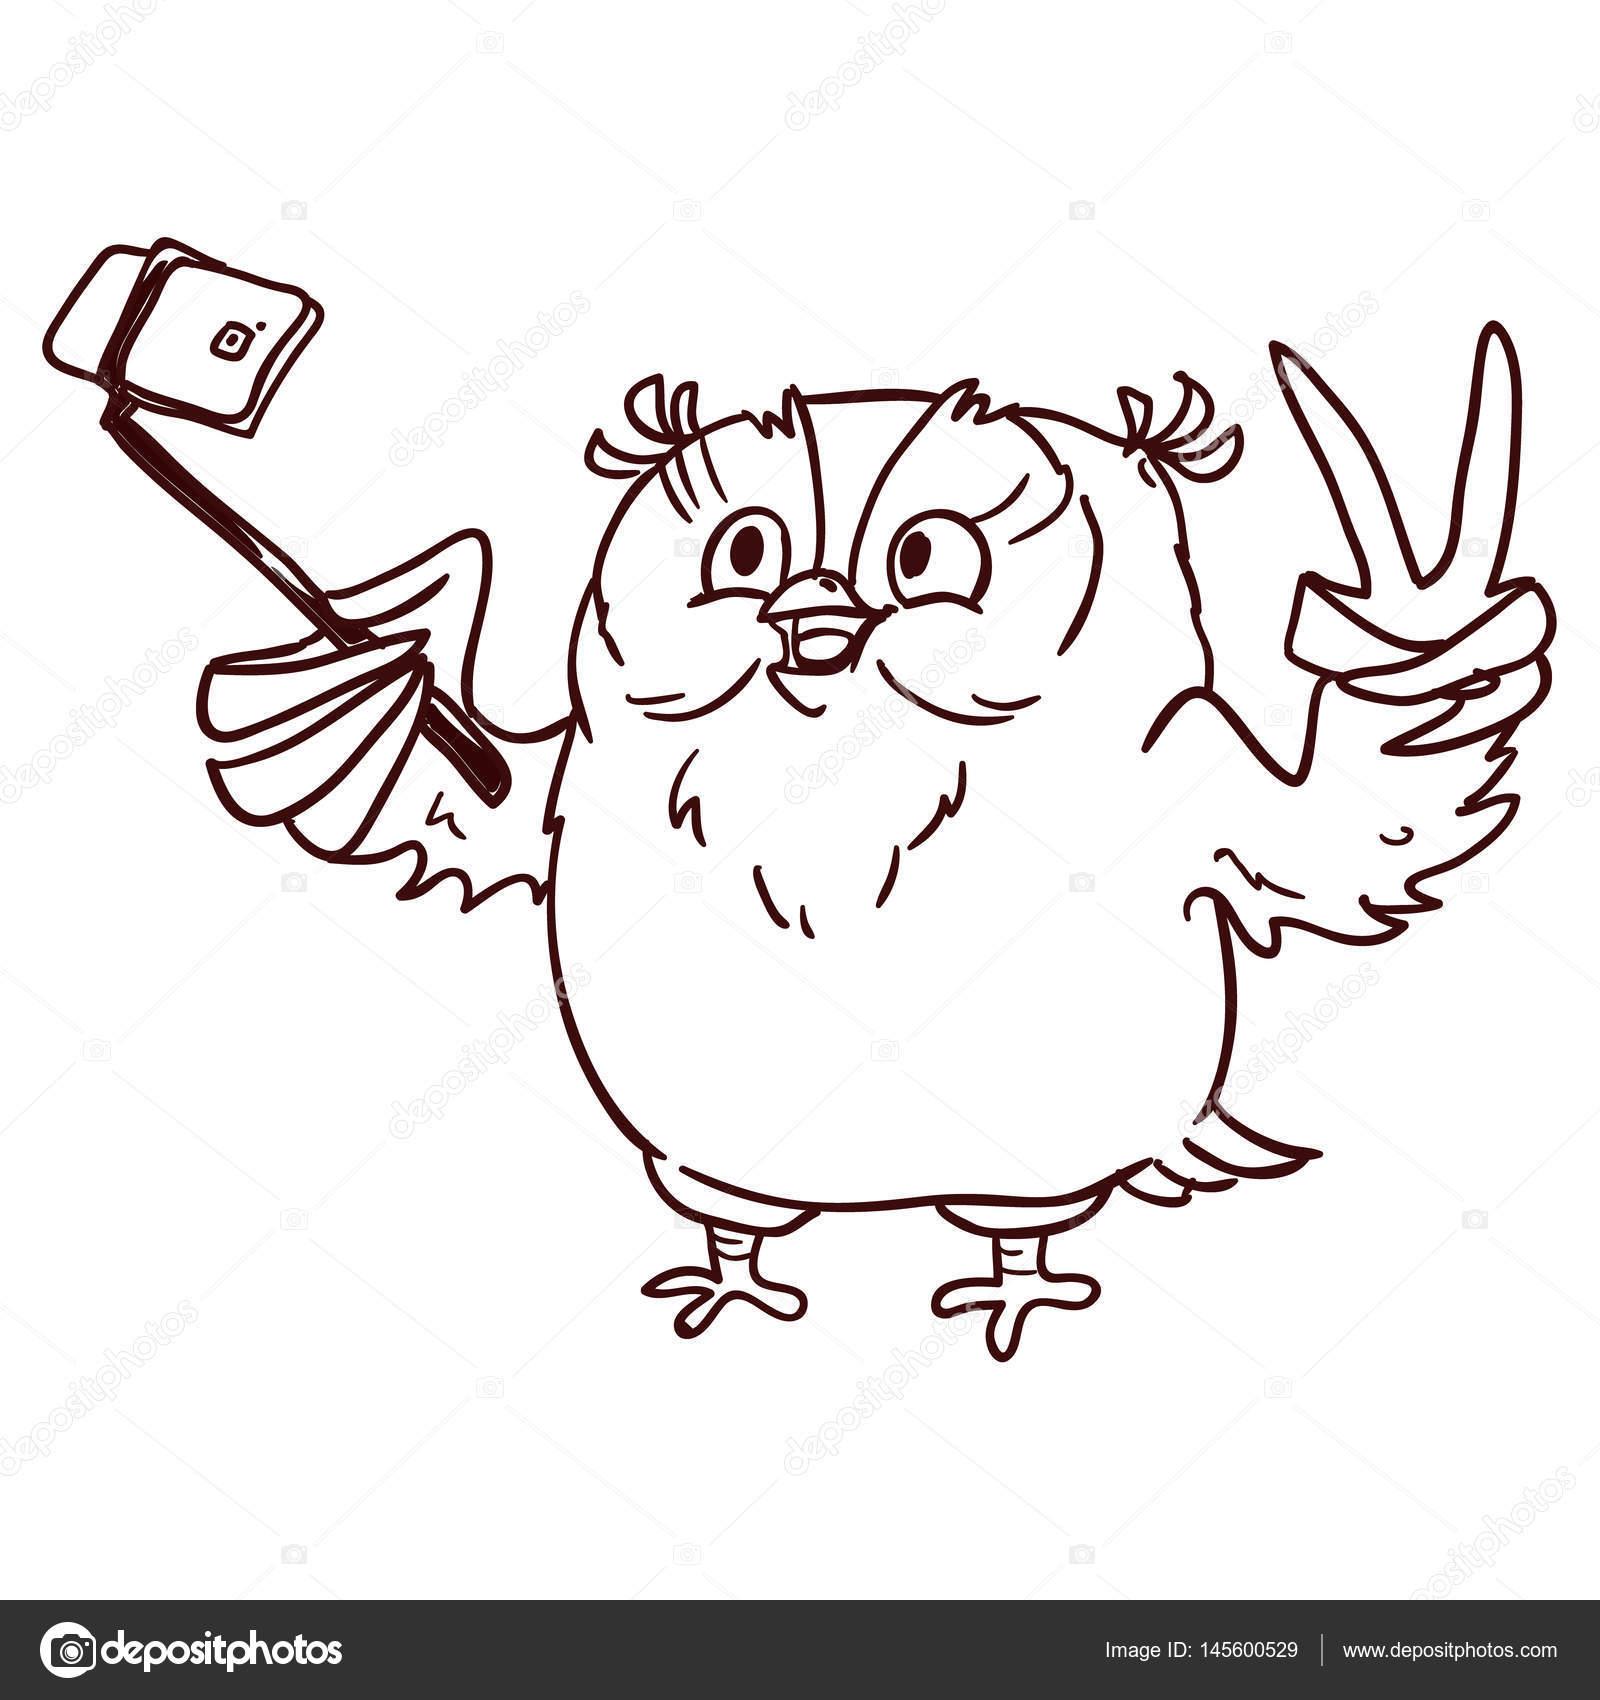 Animado Pollito Con Lentes Bonito Buho Personaje De Dibujos